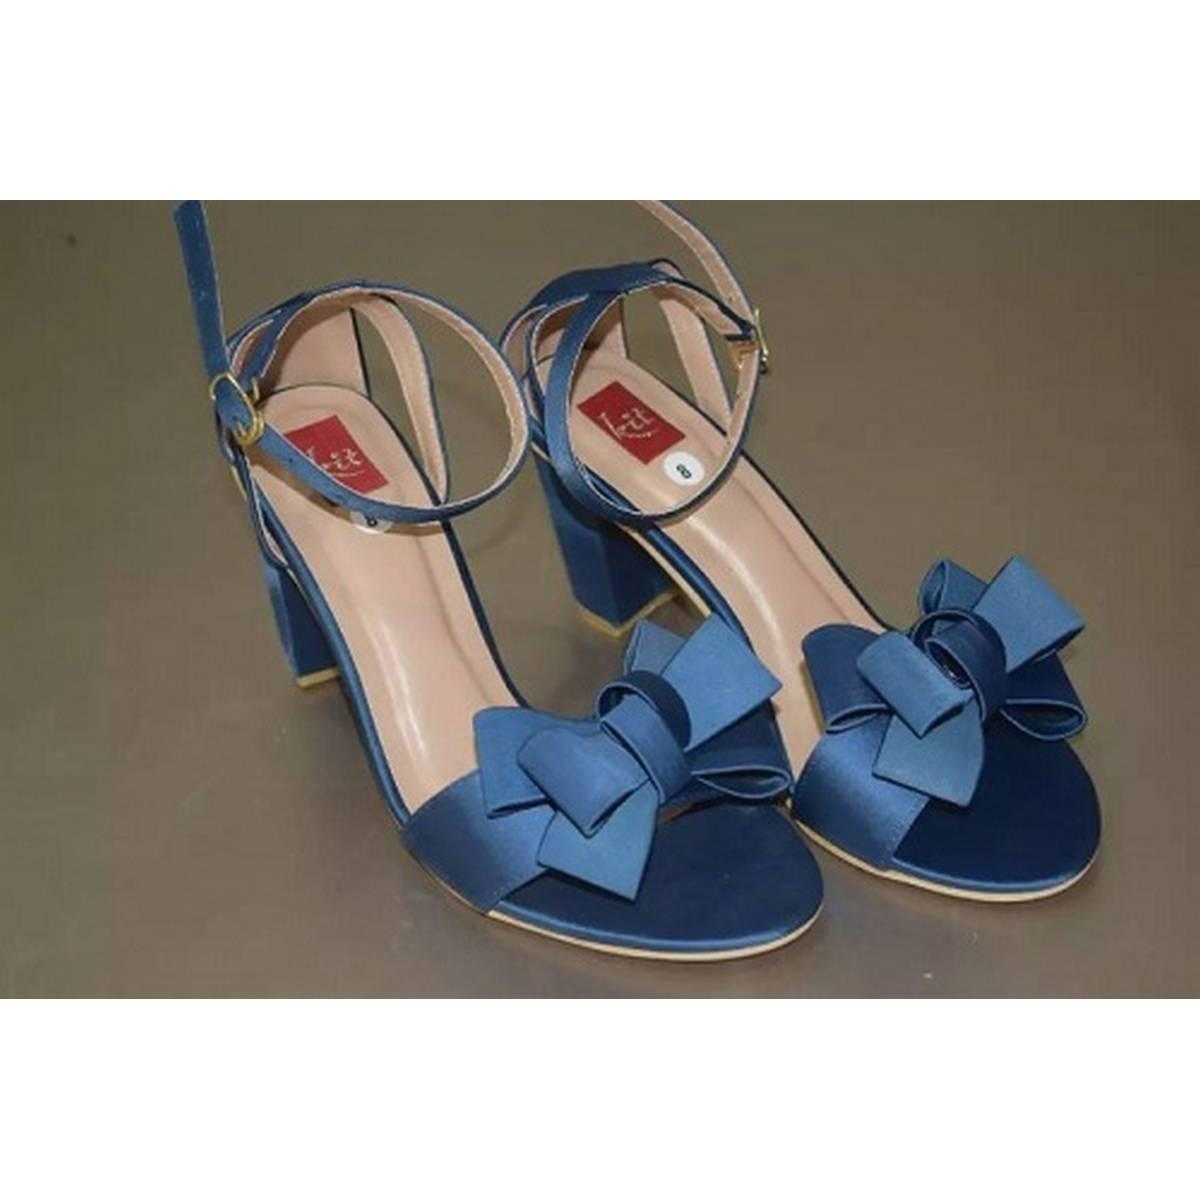 New Arrival Trending Women Butterfly High Heel sandal